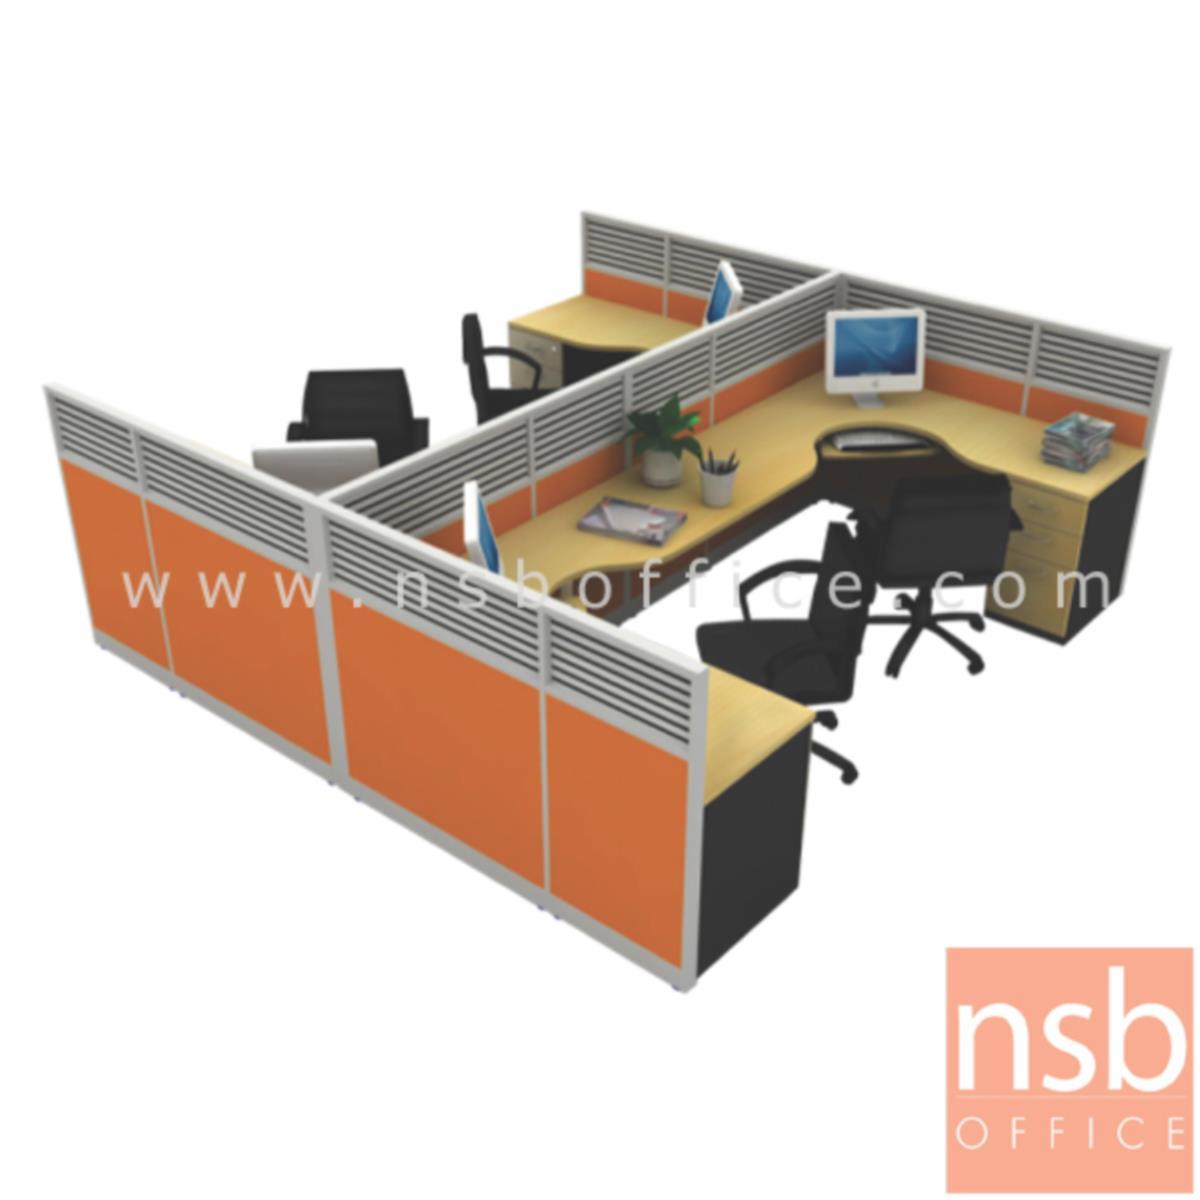 A04A023:ชุดโต๊ะทำงานกลุ่มตัวแอล 4 ที่นั่ง  รุ่น Quinto-240 ขนาด 330W cm. พร้อมตู้ลิ้นชัก พาร์ทิชั่น Hybrid